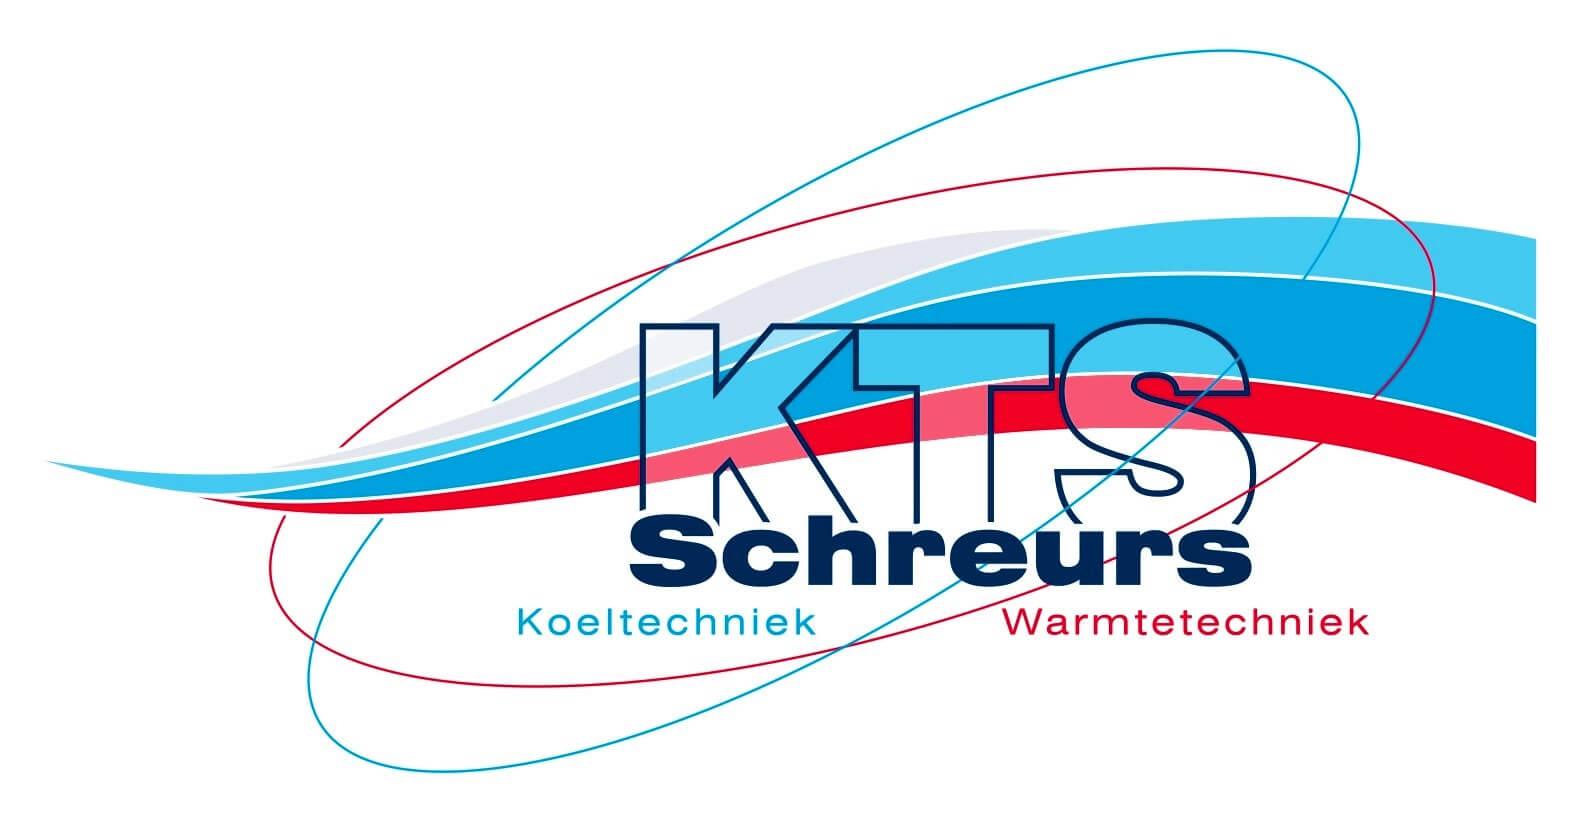 04117KTS Schreurs logo tbv drukwerk (2)